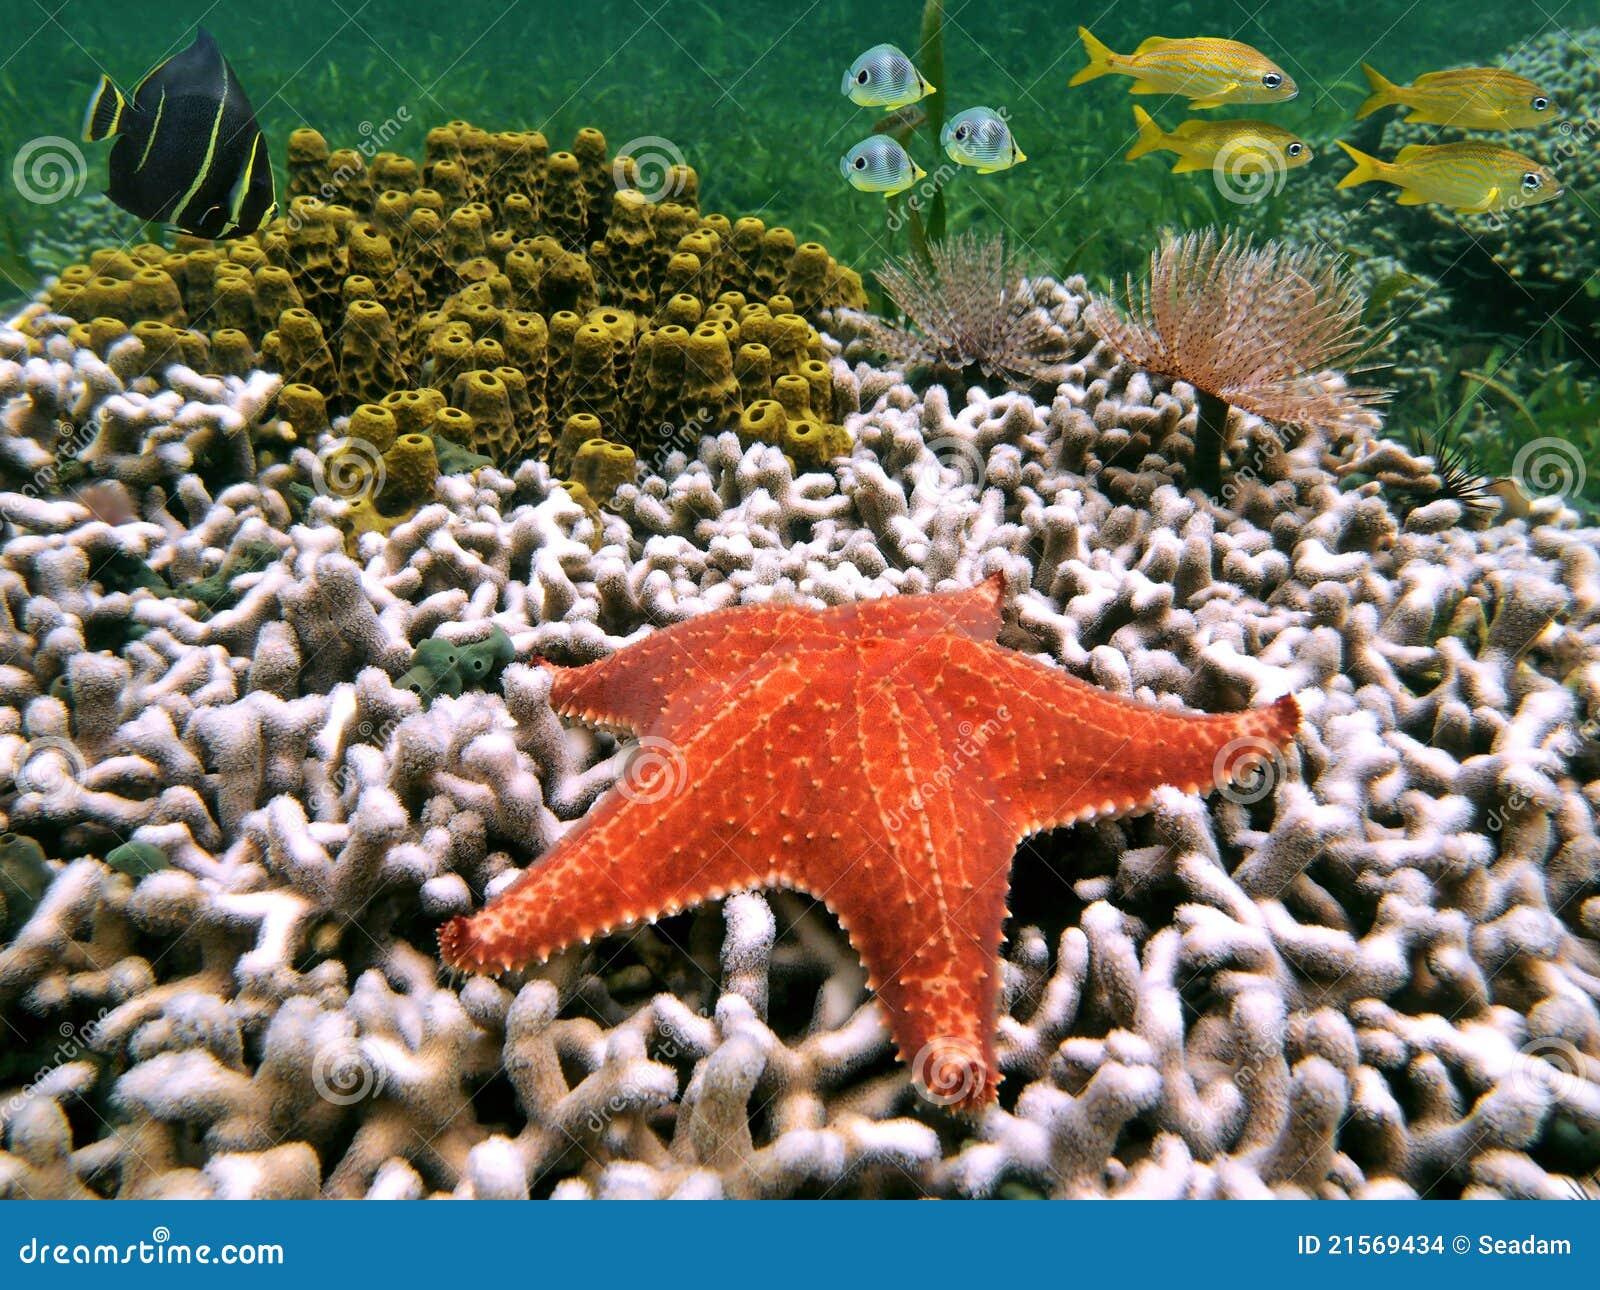 Starfish and fish stock photo. Image of nature, ecosystem - 21569434